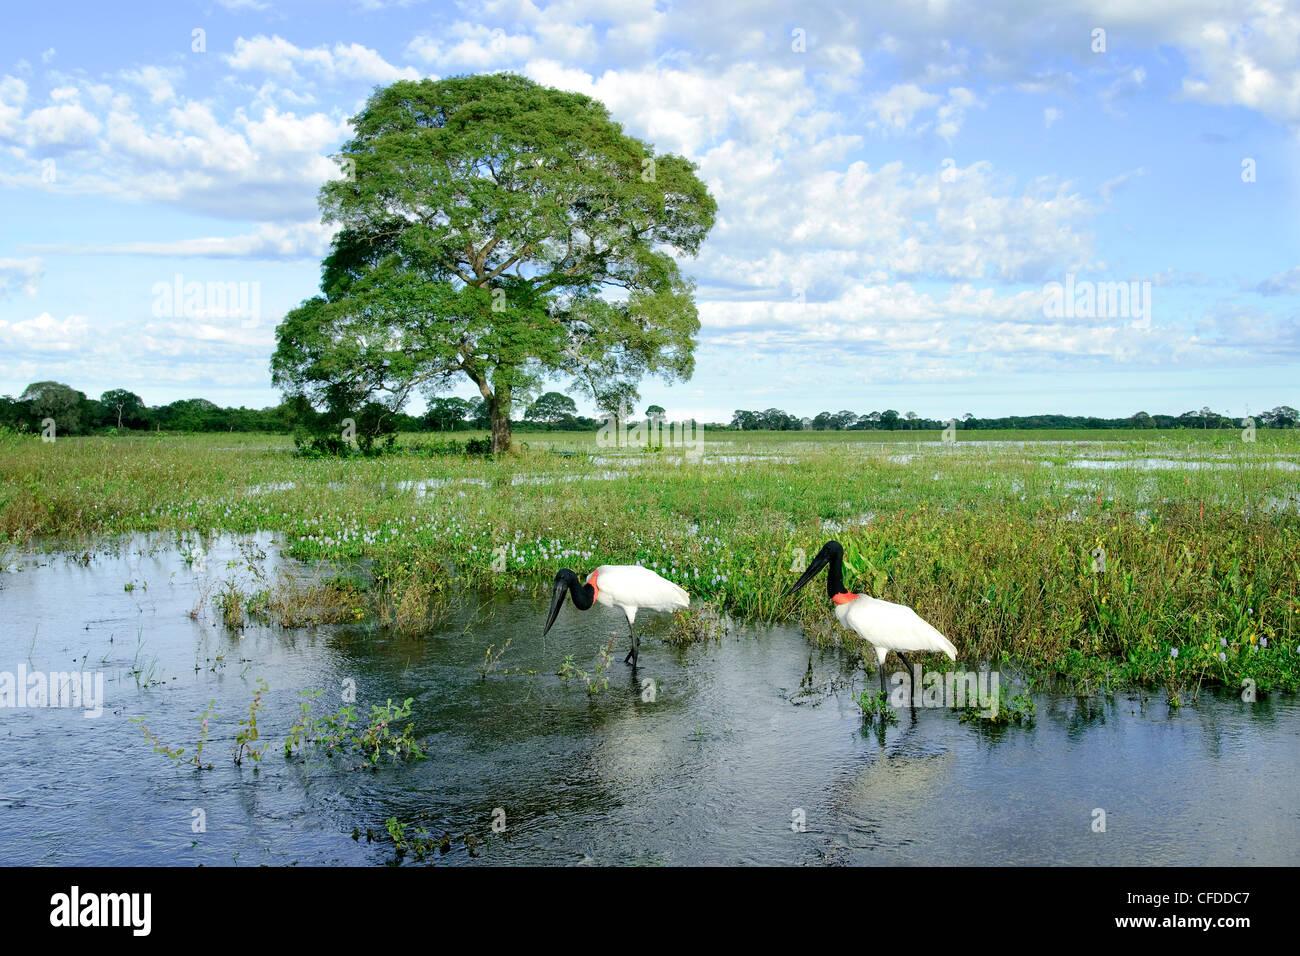 Adult jabiru stork (Jabiru mycteria), Pantanal wetlands, Southwestern Brazil, South America - Stock Image